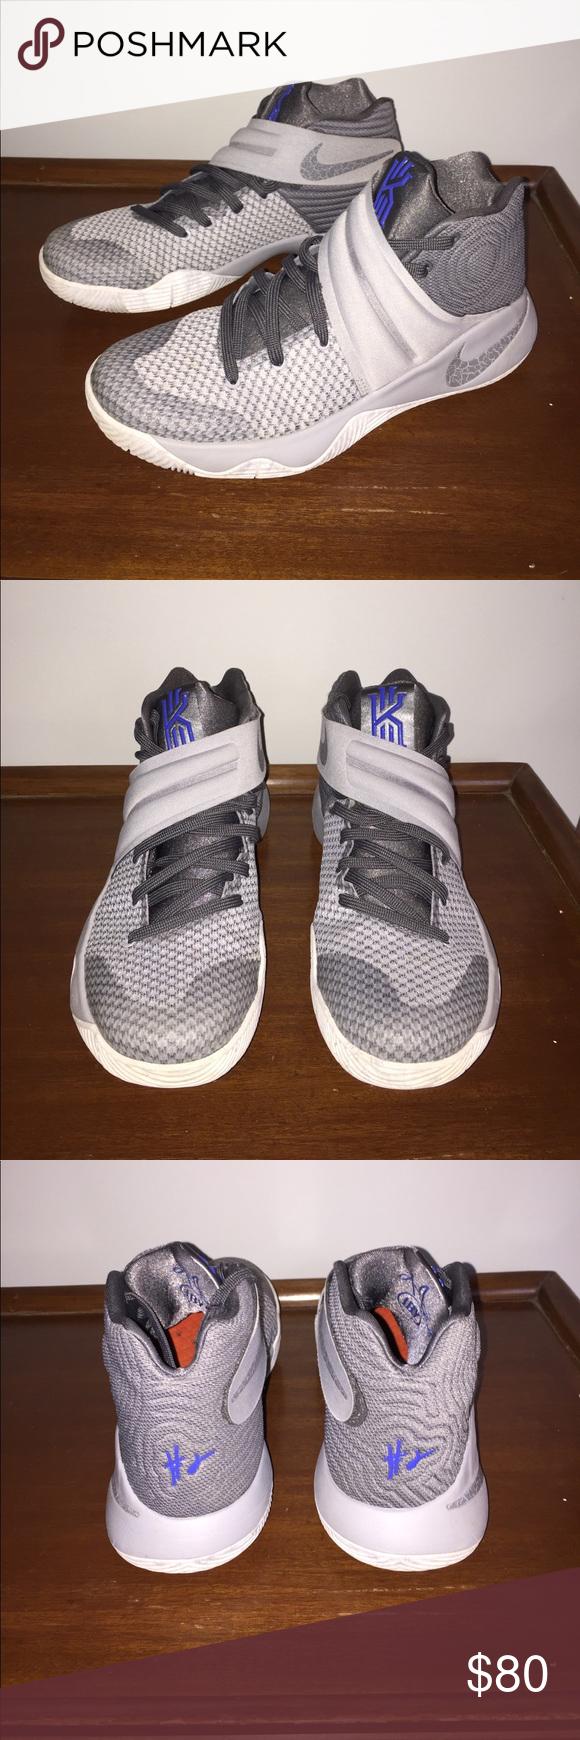 separation shoes ae196 45a01 ... canada kyrie 2 wolf grå in original nike box sko sneakers nike original  sko and e25a75